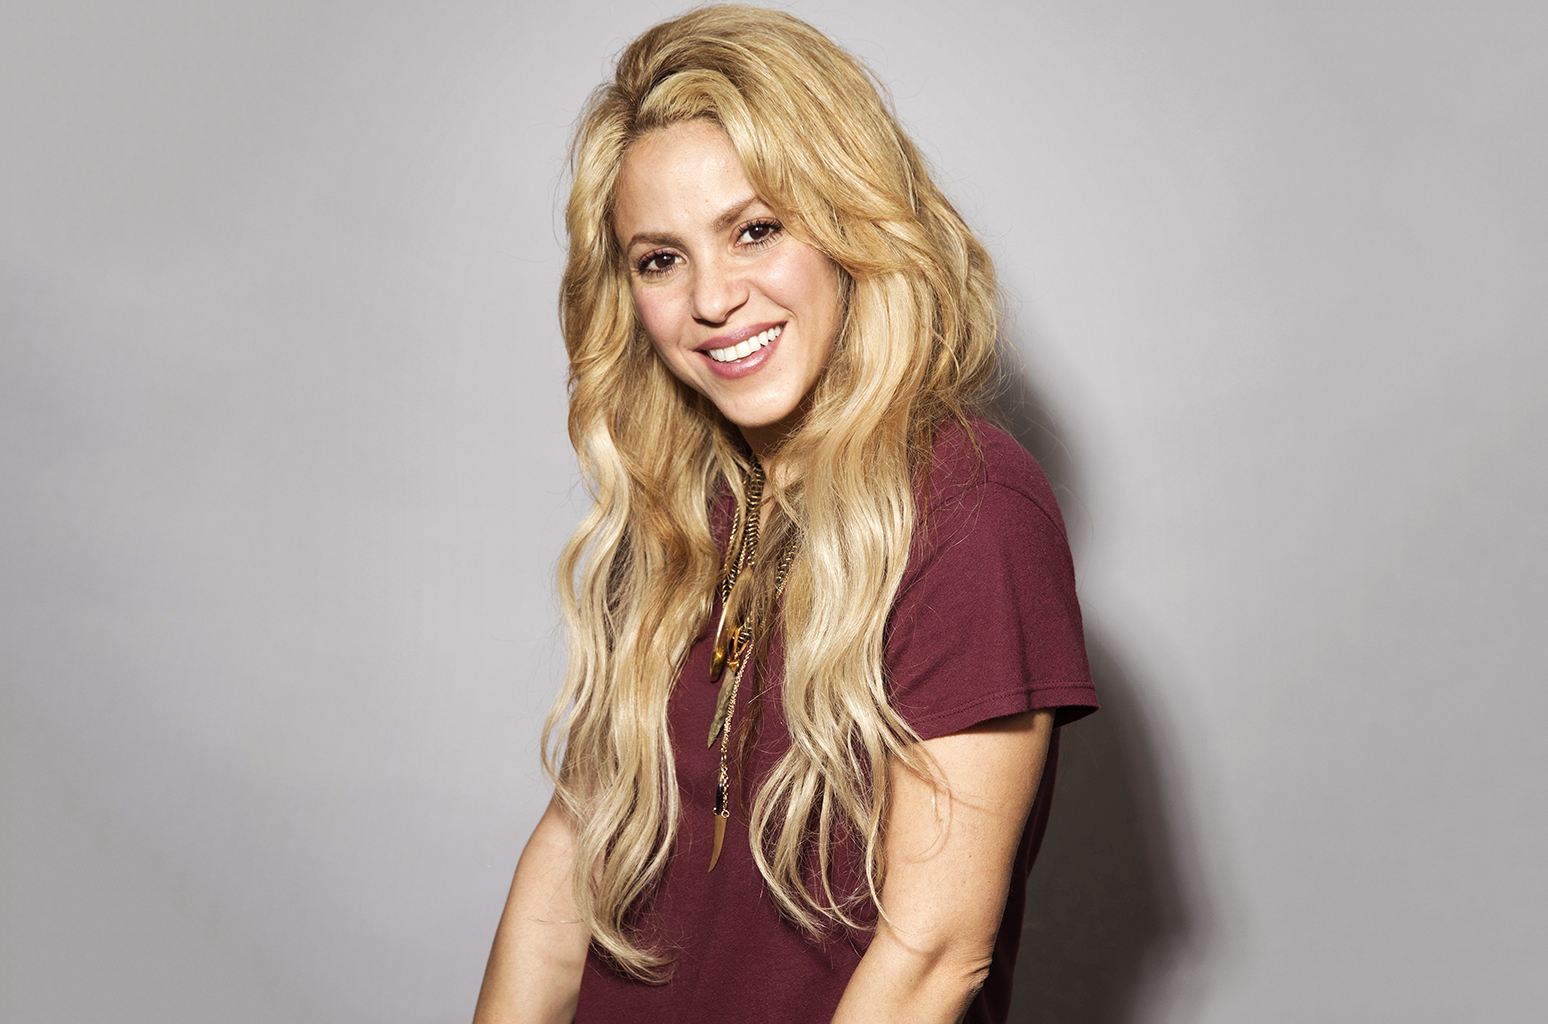 Resultado de imagen para Shakira